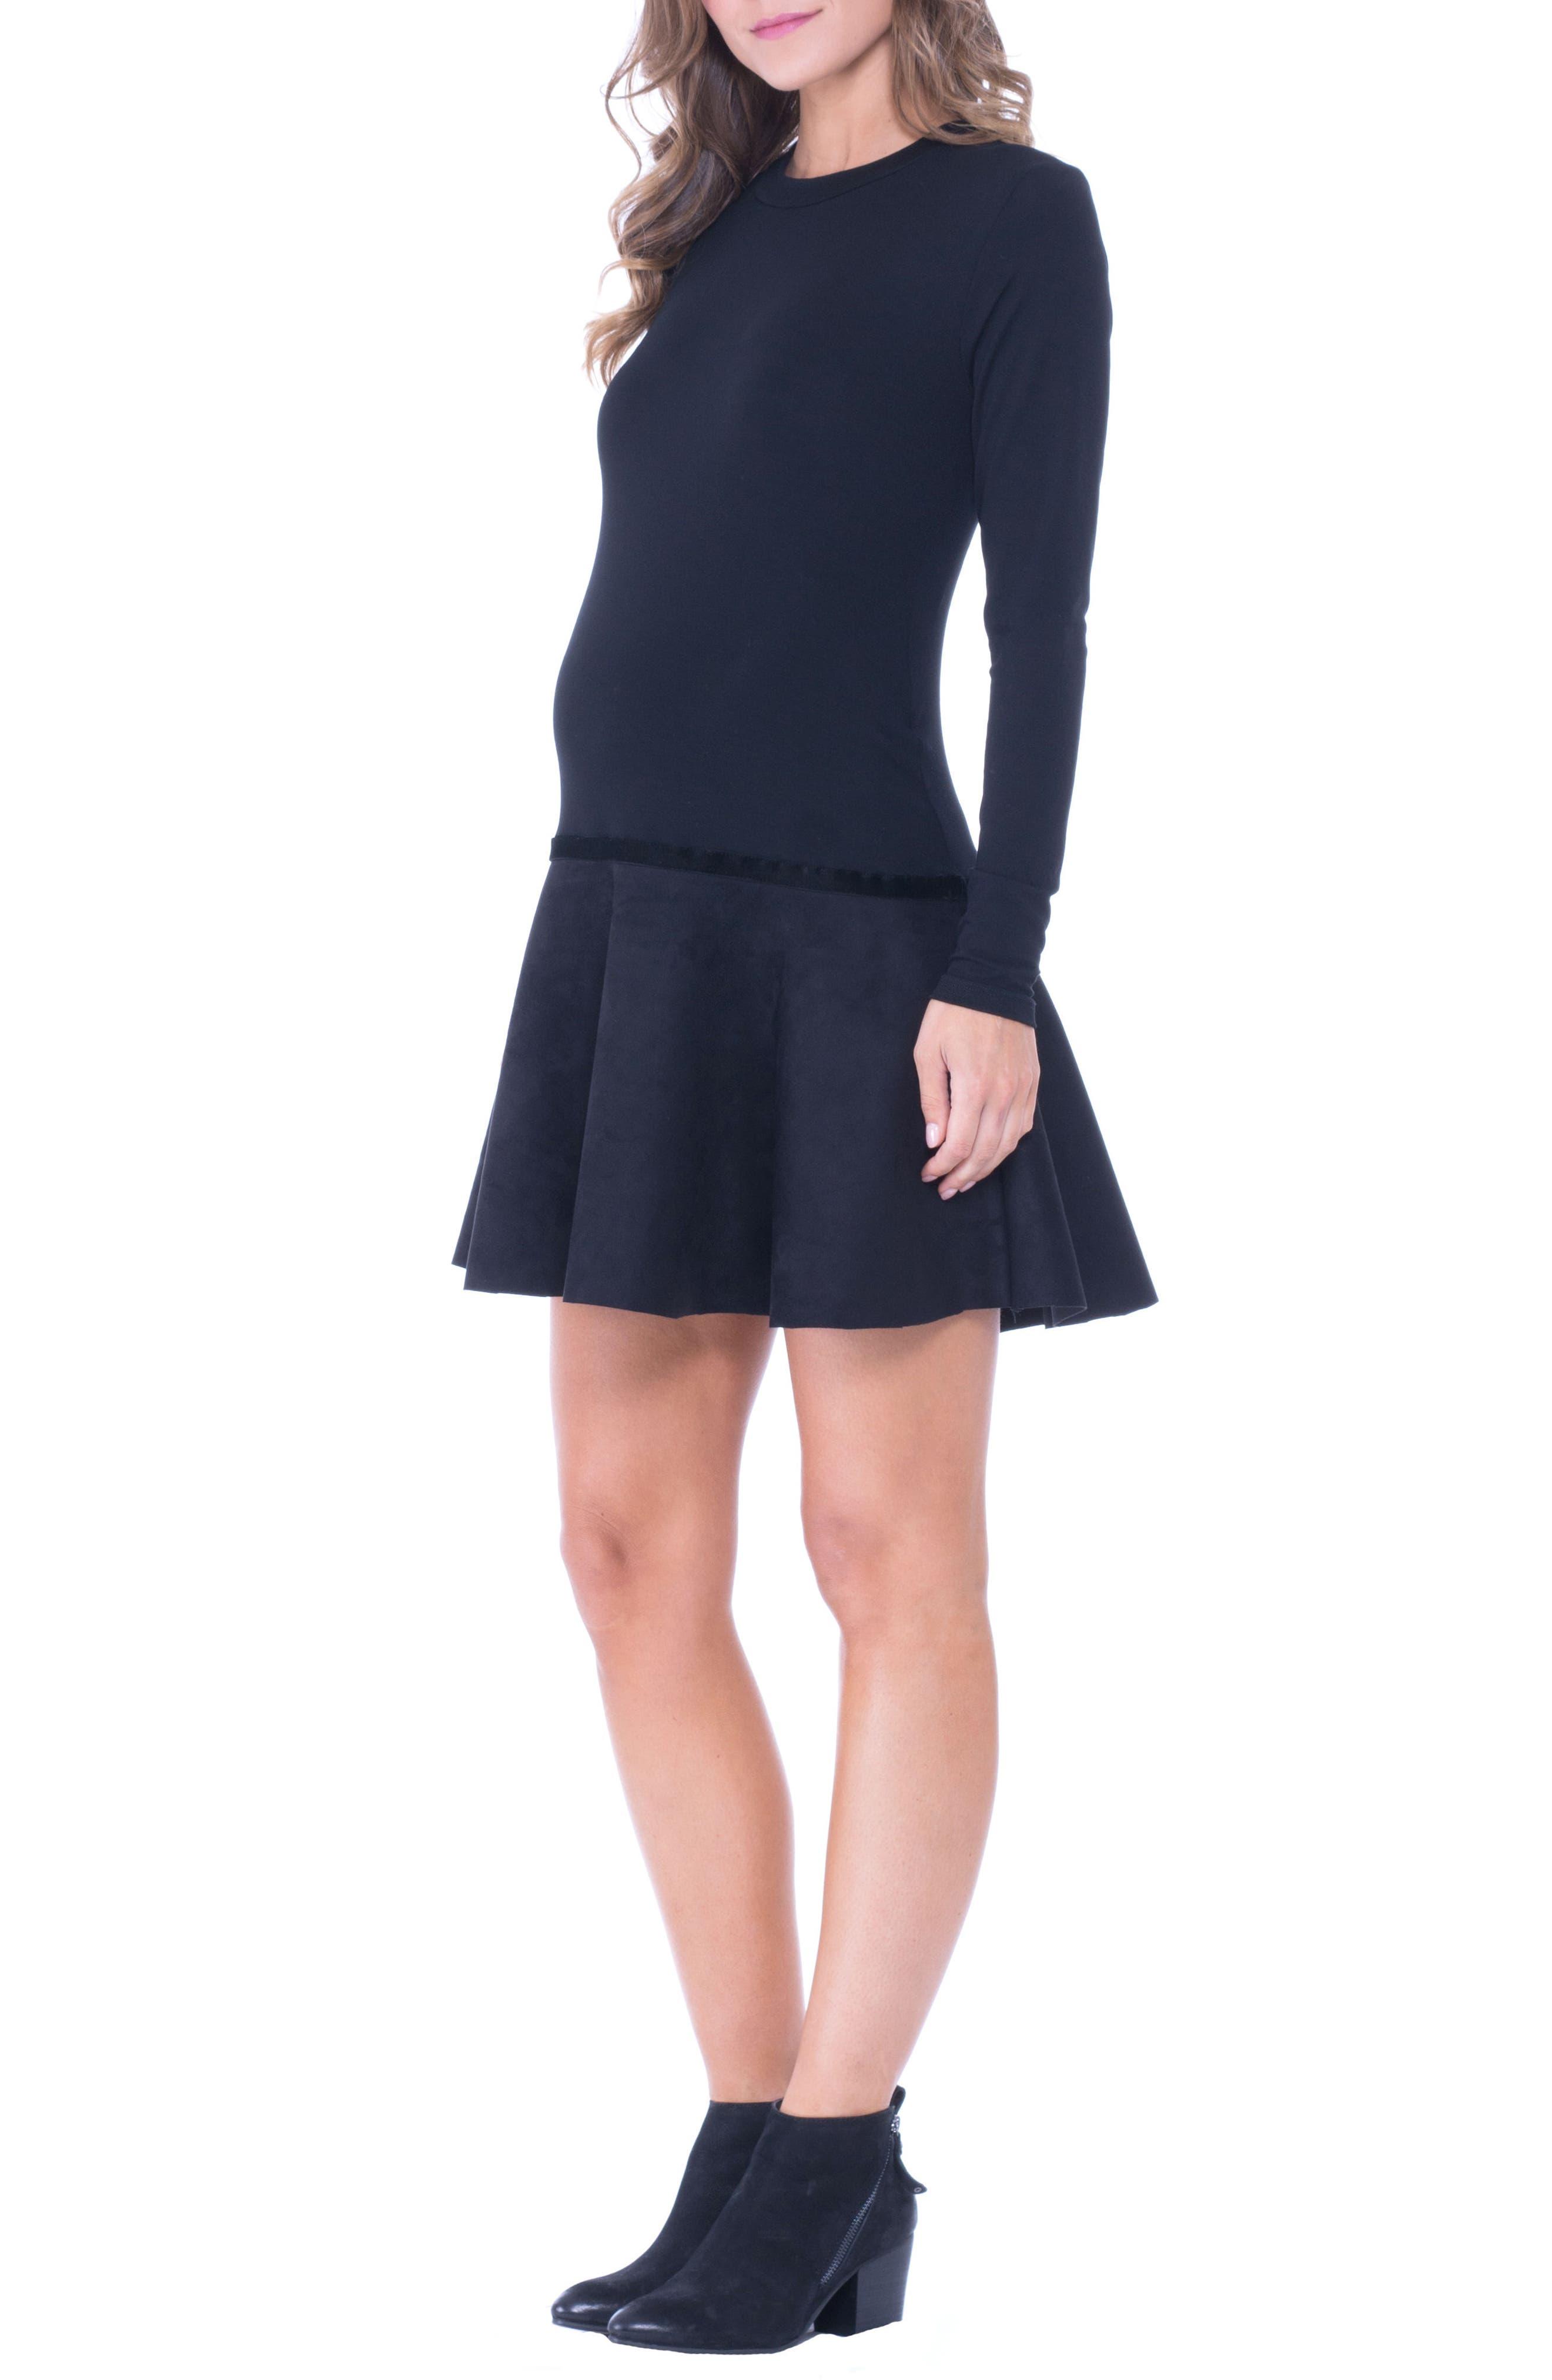 Faux Suede Skirt Maternity Skater Dress,                             Alternate thumbnail 3, color,                             BLACK